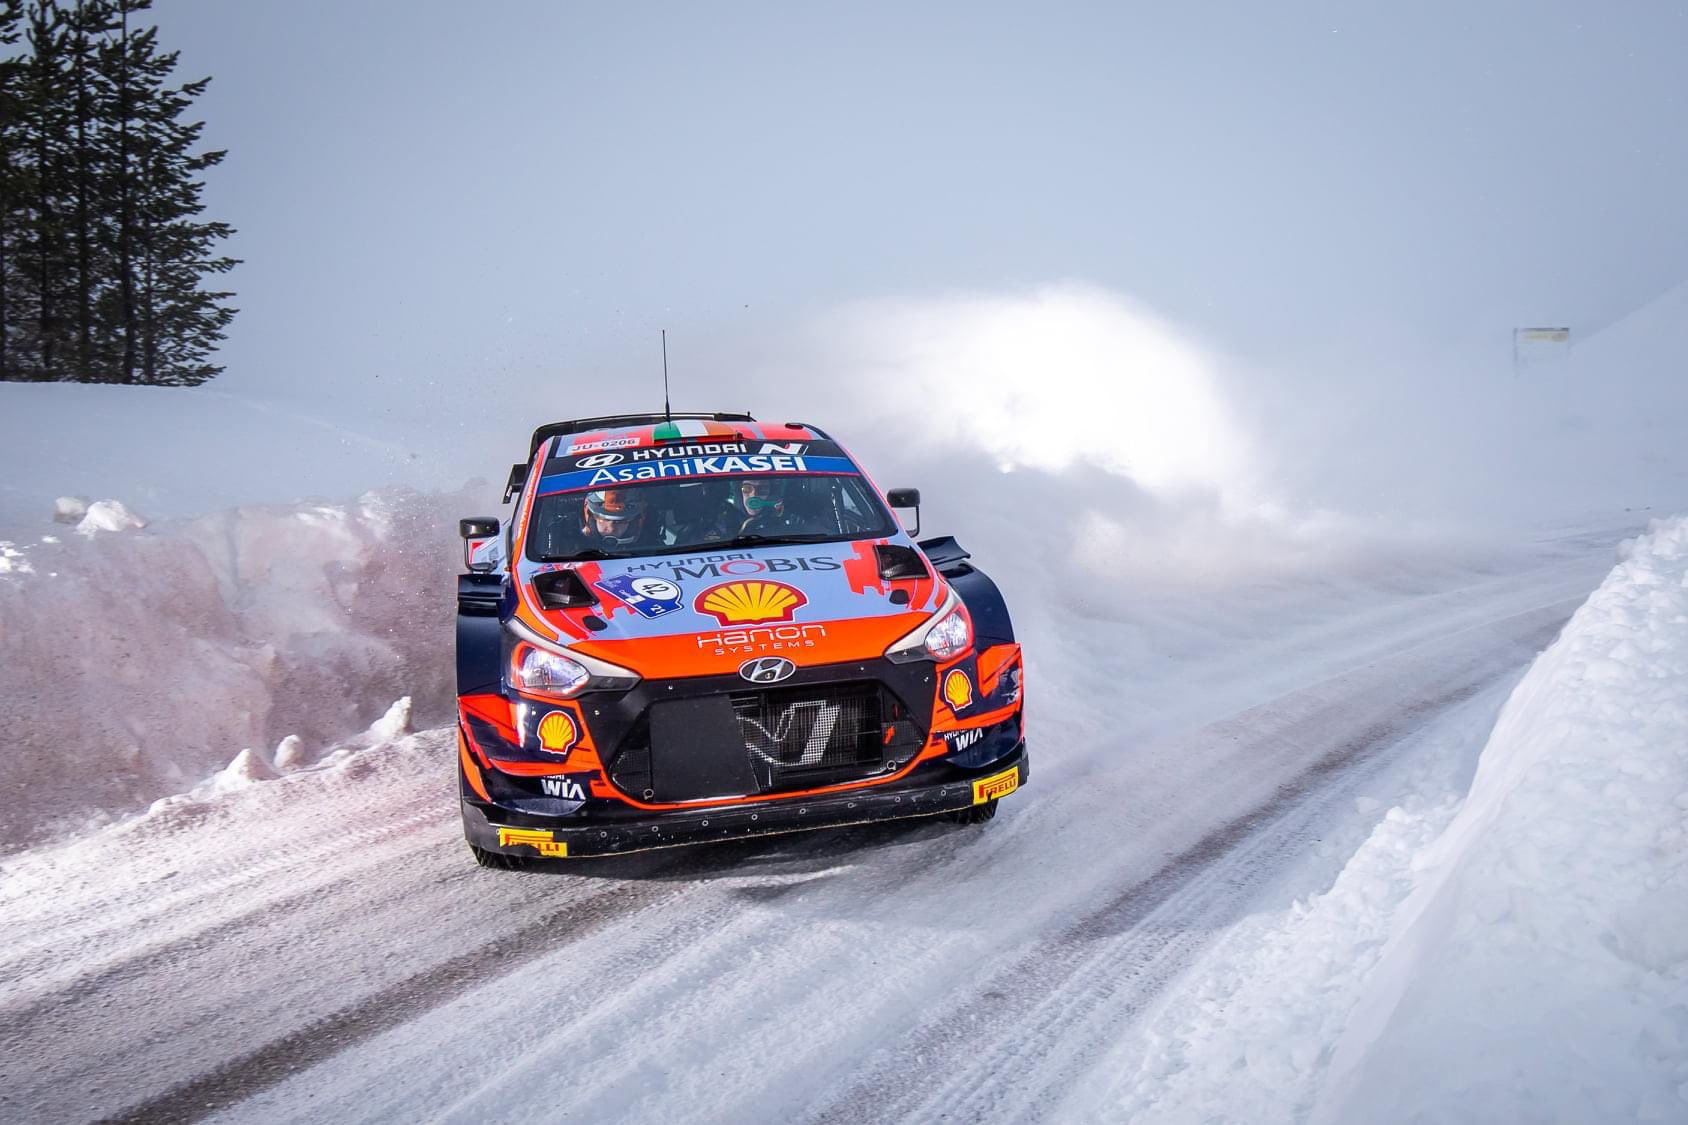 WRC: Arctic Rally Finland - Powered by CapitalBox [26-28 Febrero] - Página 3 EvKI7zfXAAIYao4?format=jpg&name=large